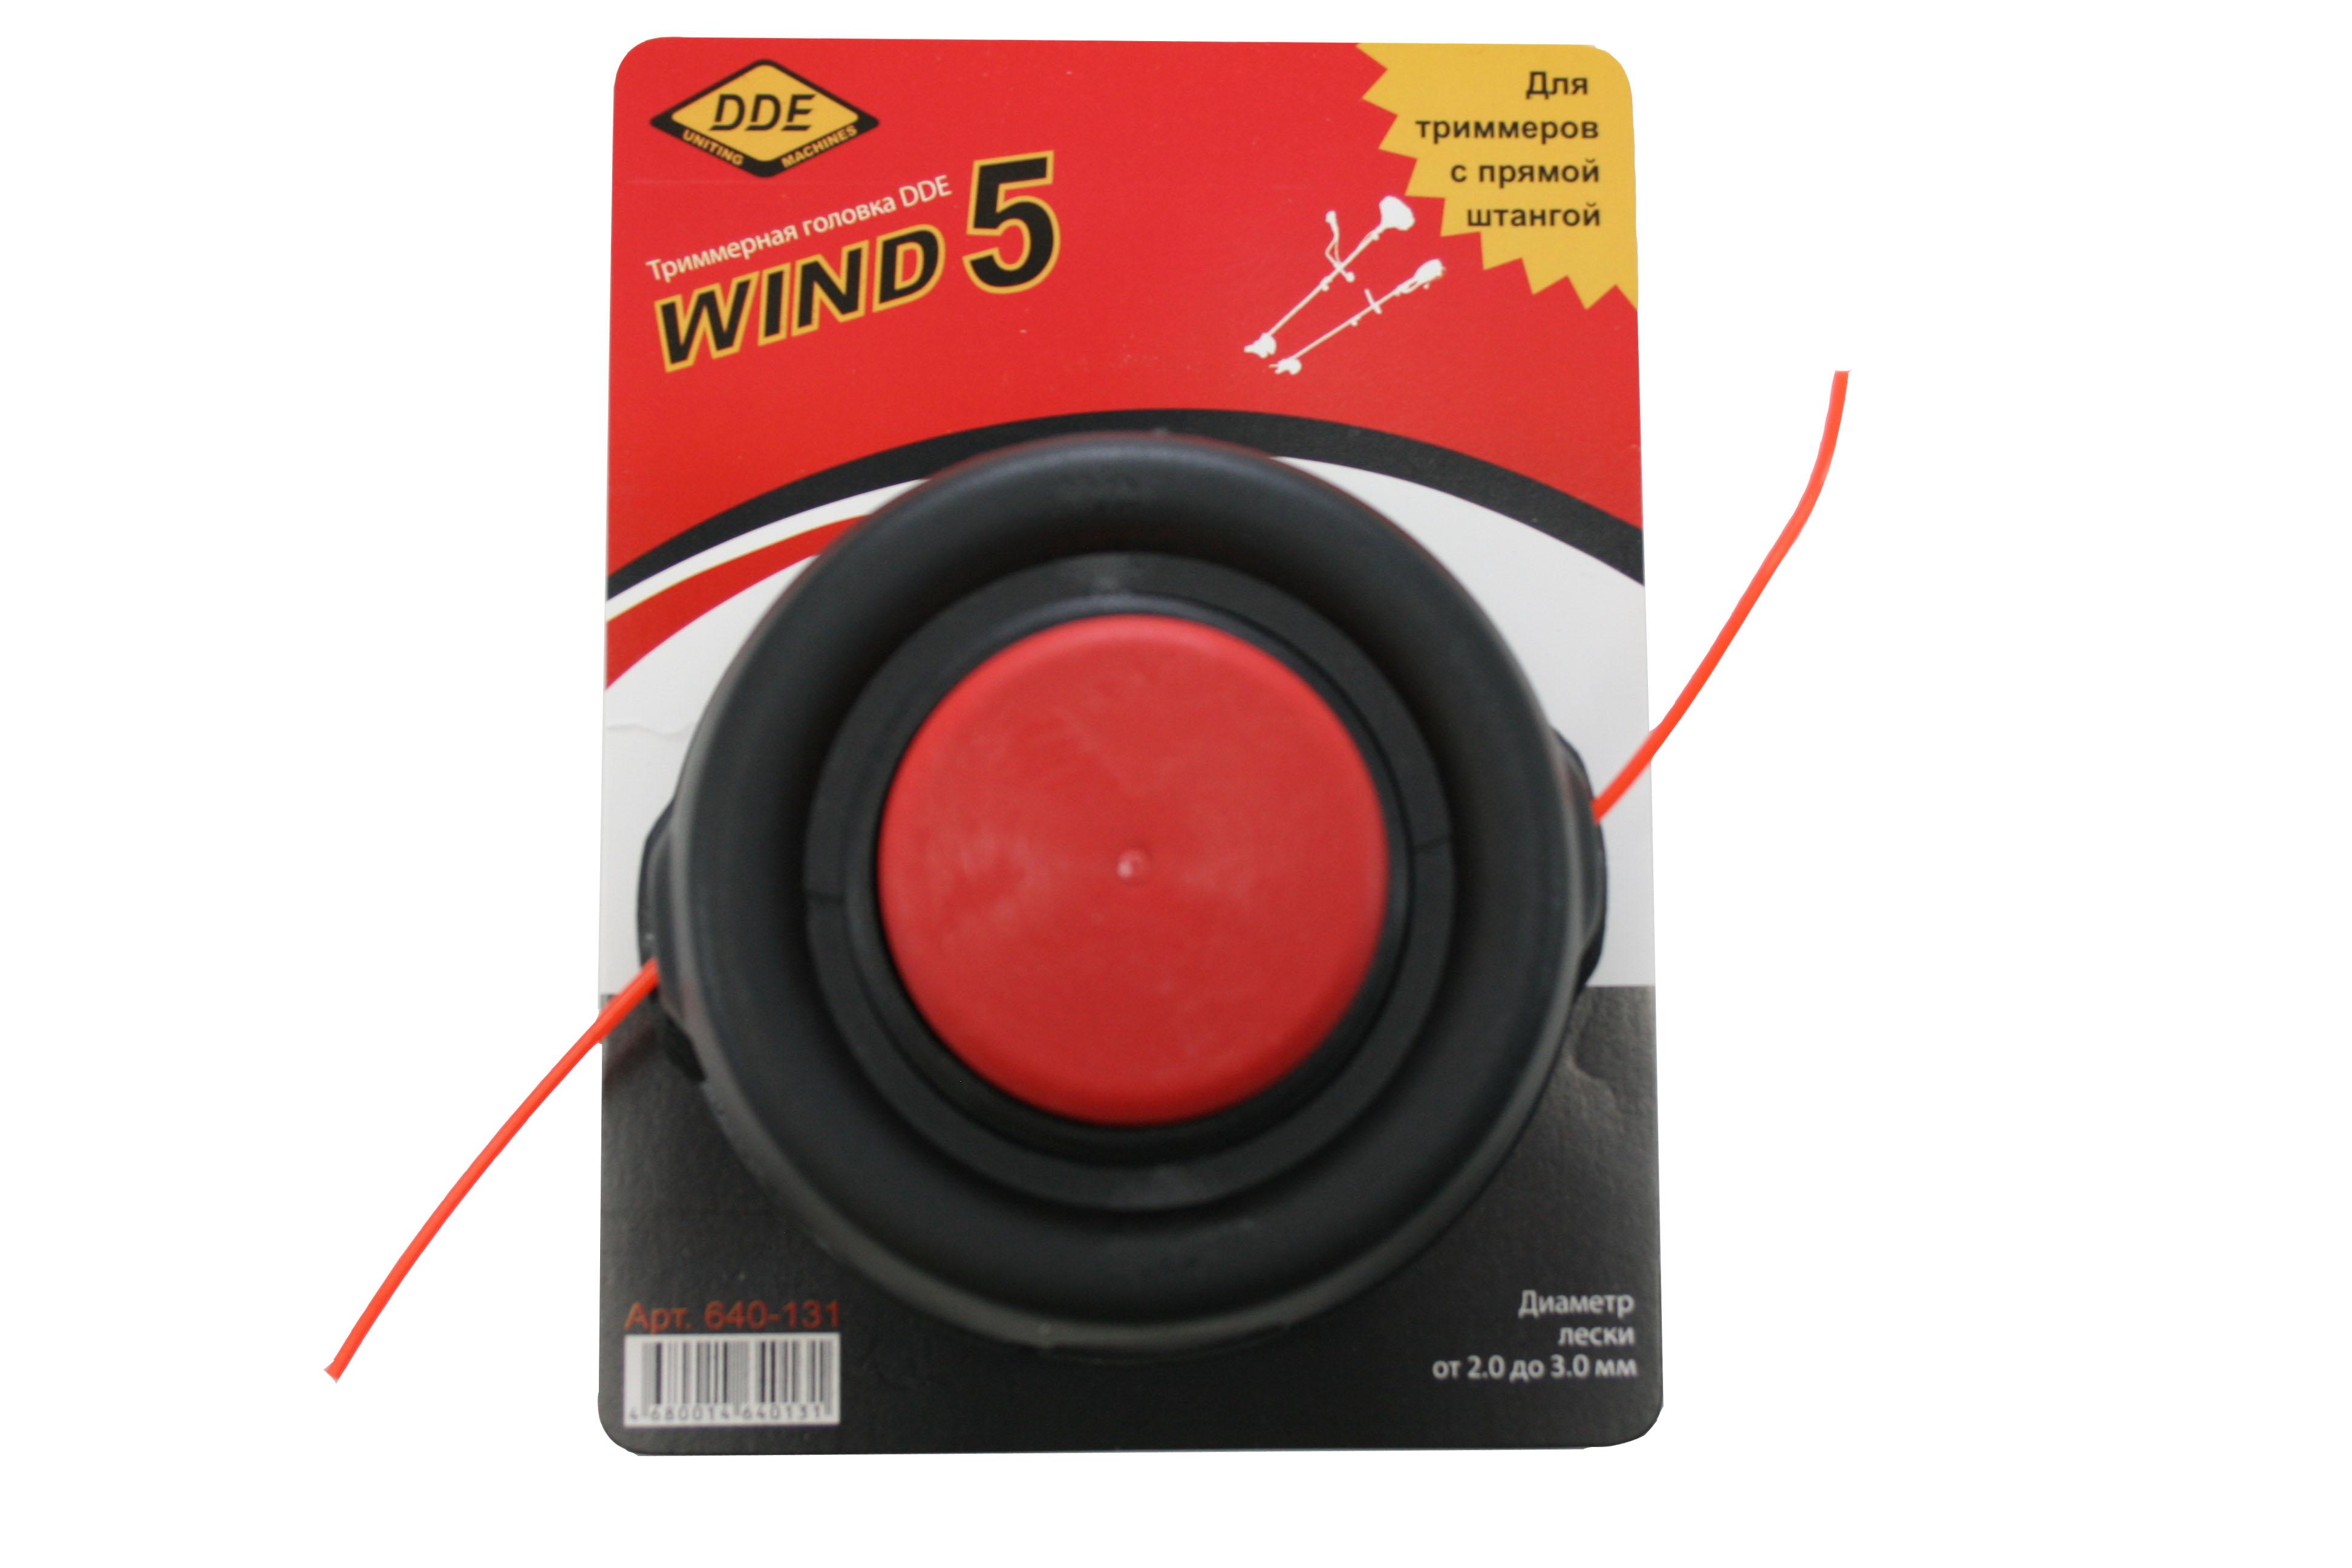 Режущая головка для кос Dde Wind5 головка триммернаяwind 3 dde 640 117